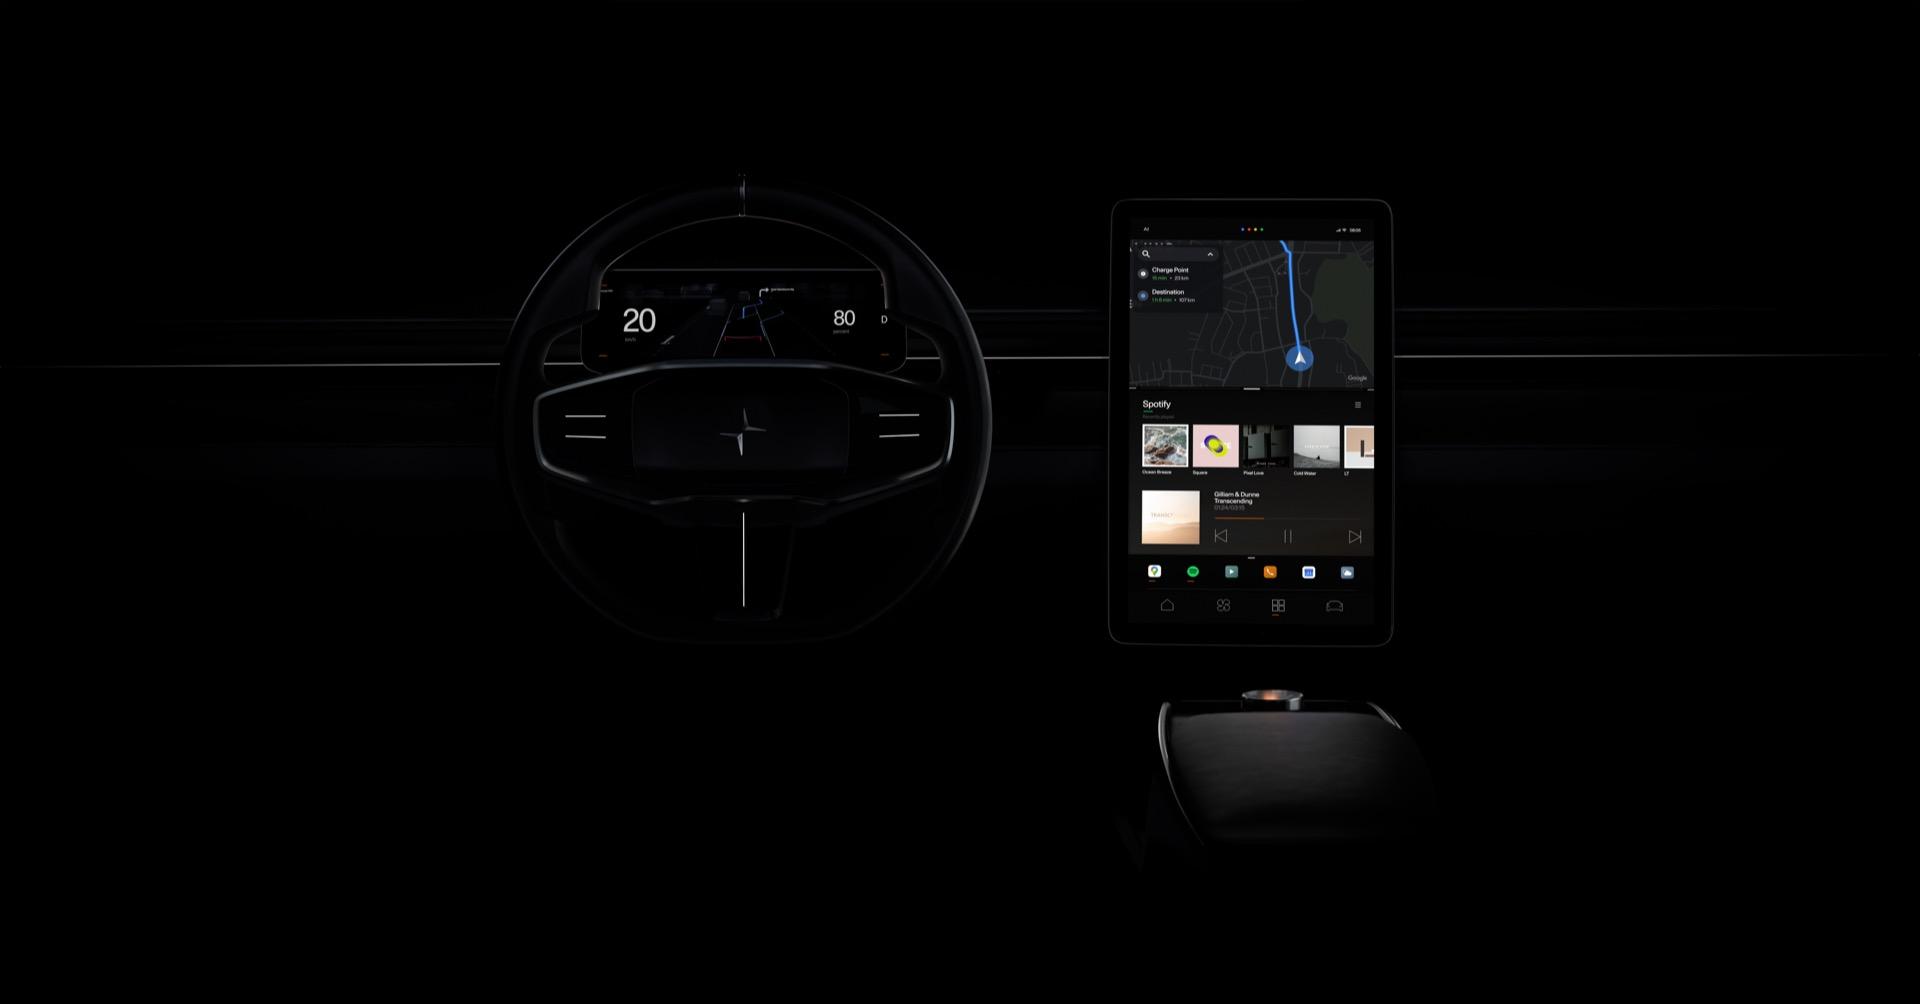 Polestar EV brand shows its future interface beyond the Polestar 2